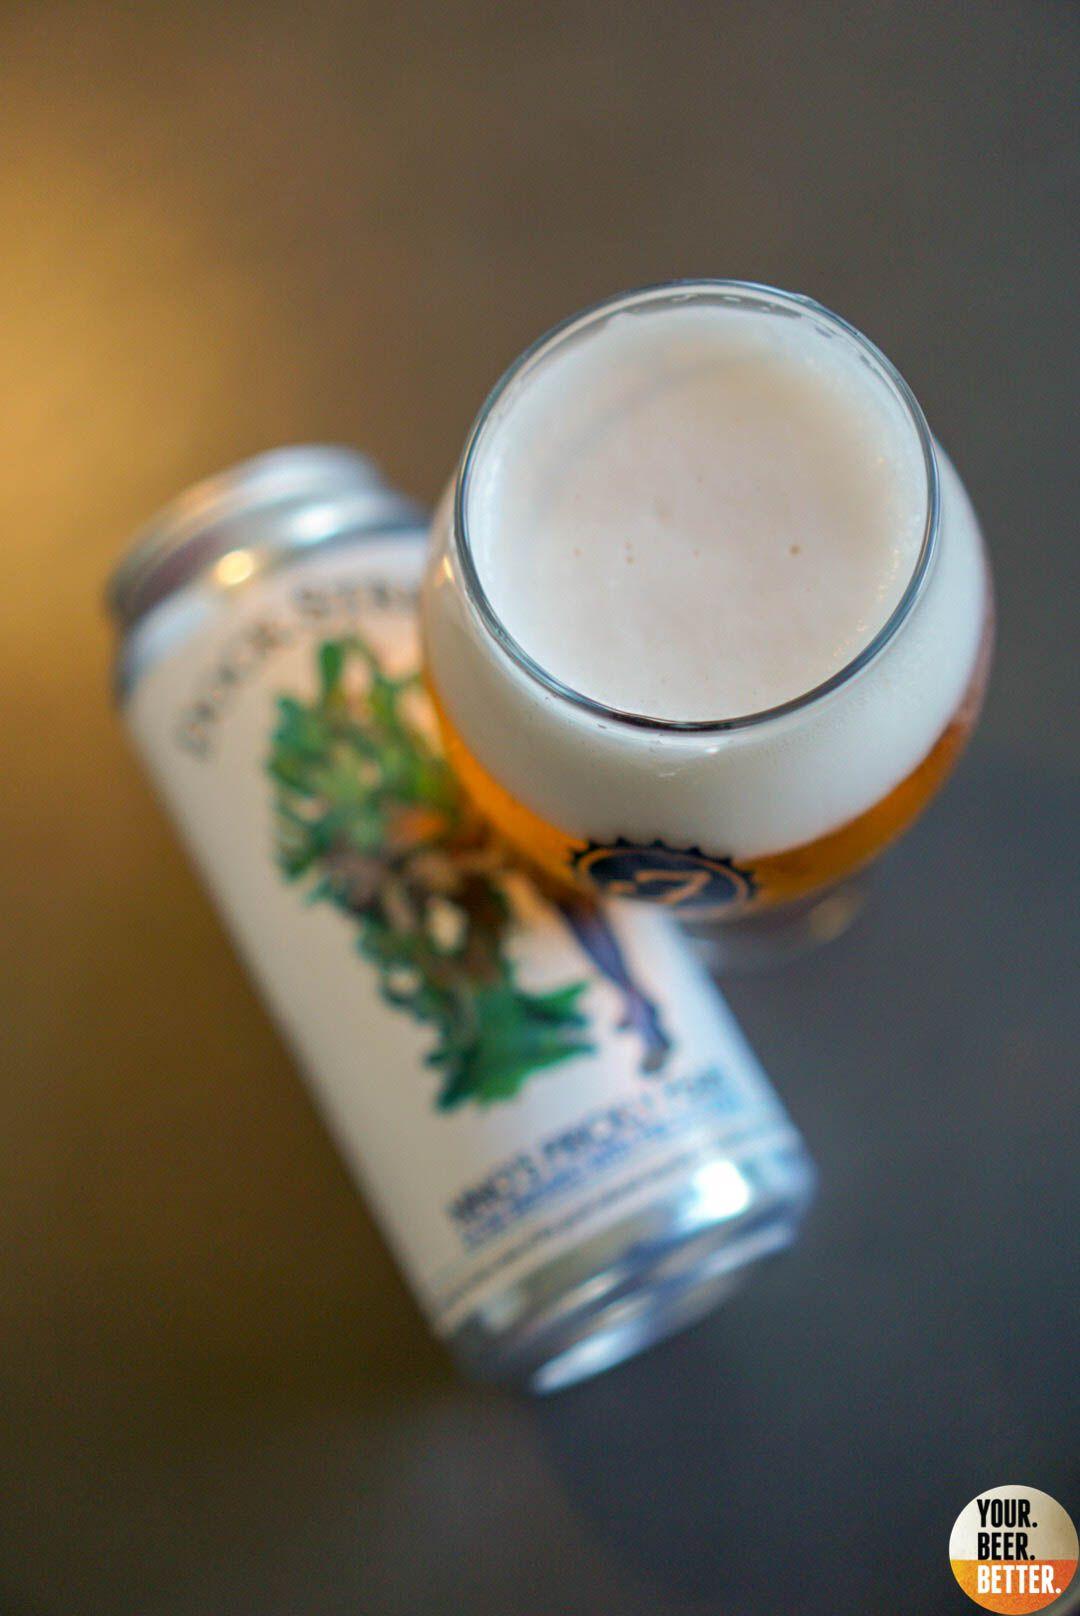 Dockstreetbeer A Little Prickly Pear Never Hurt Anybody Aroma Yourbeerbetter Smooth Creamy Bier Cerveza Bee Fresh Beer Craft Beer Lovers Craft Beer